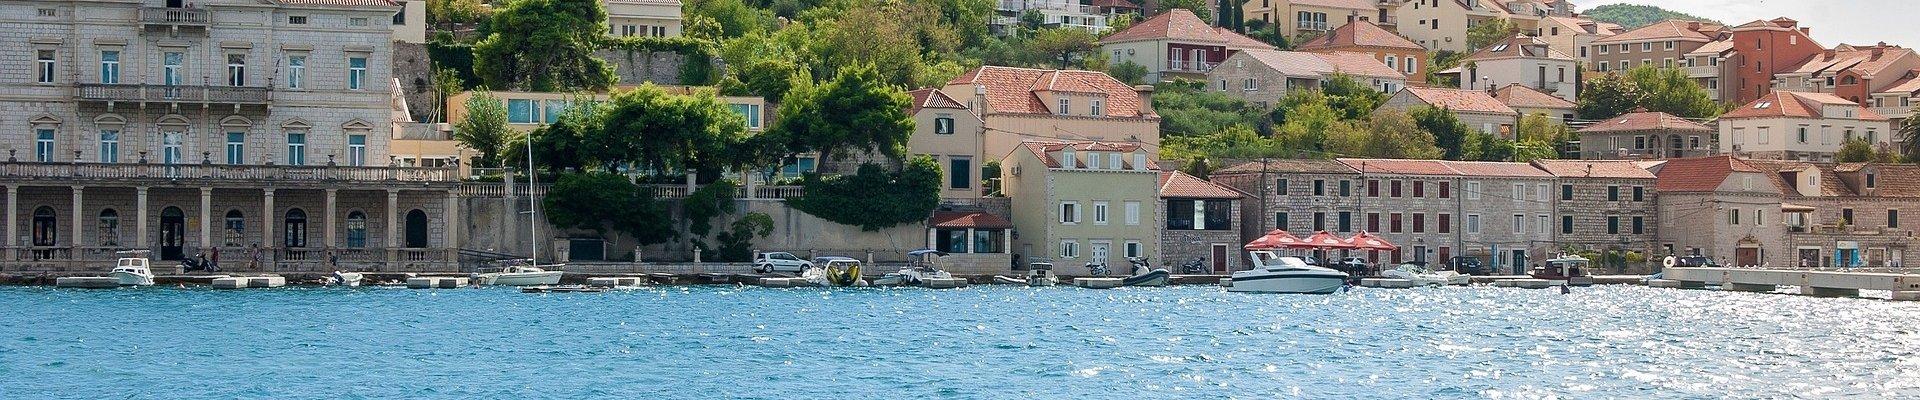 Go to Croatia!